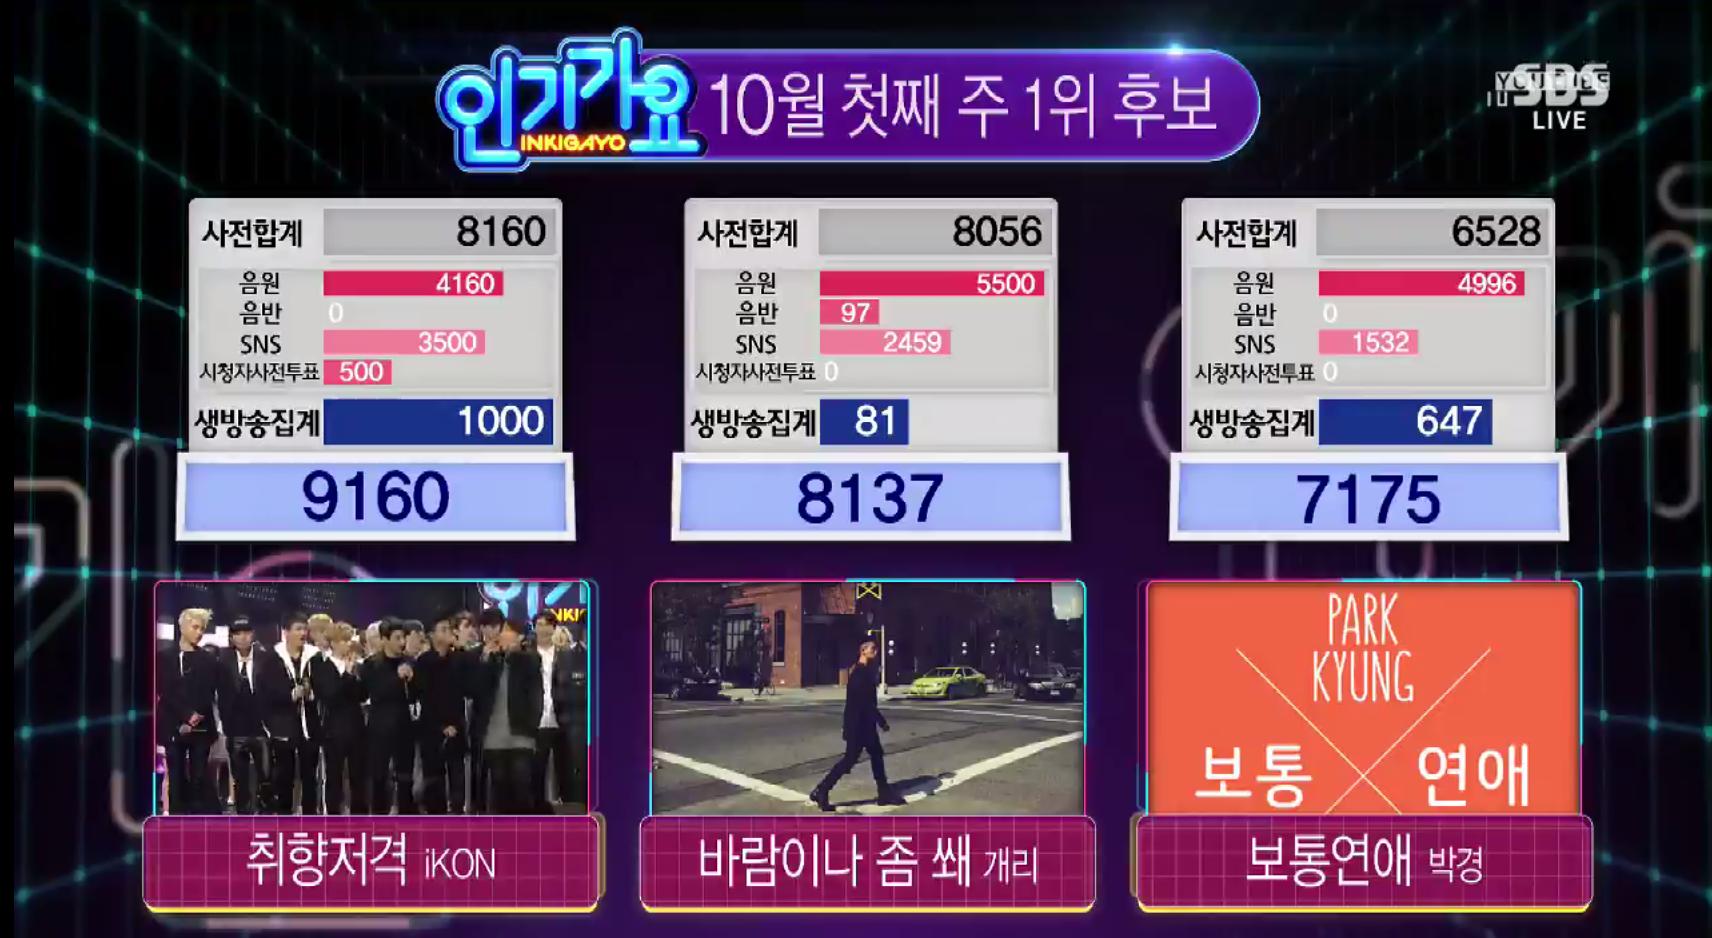 ikon inkigayo my type 3rd win